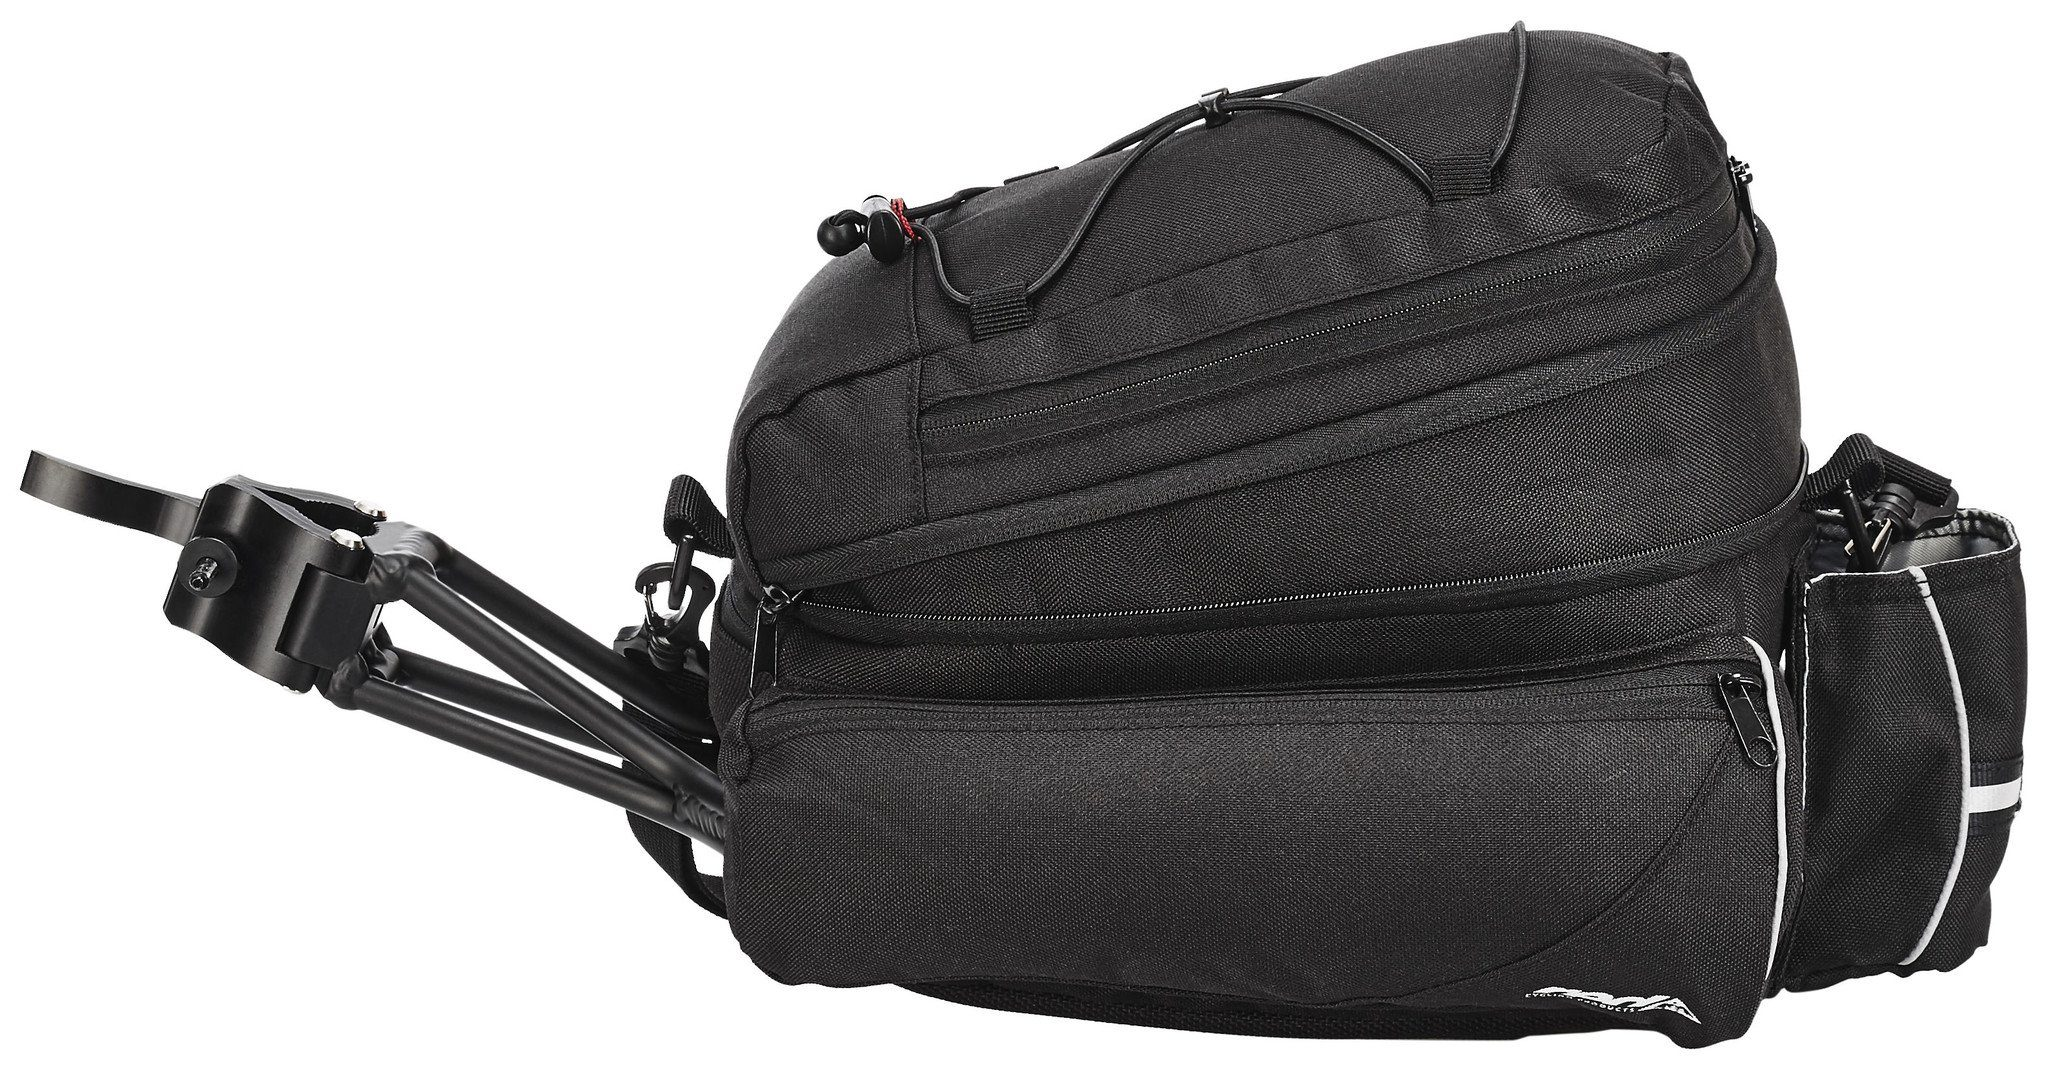 Red Cycling Products Fahrradtasche »PRO Back Loader Sattelstütztasche«